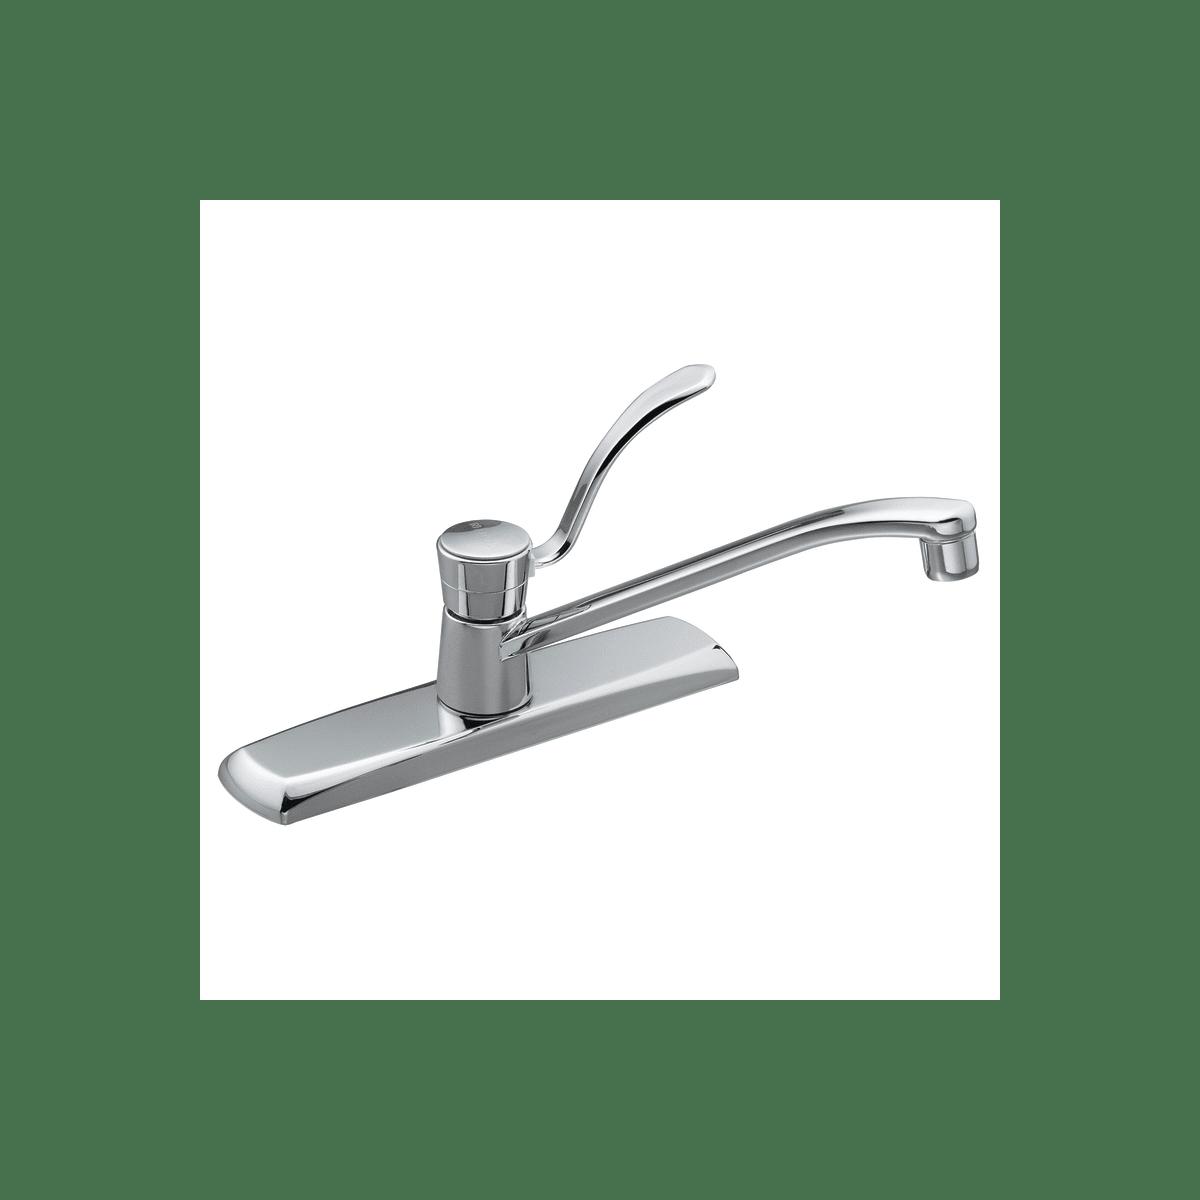 moen 7300 chrome single handle kitchen